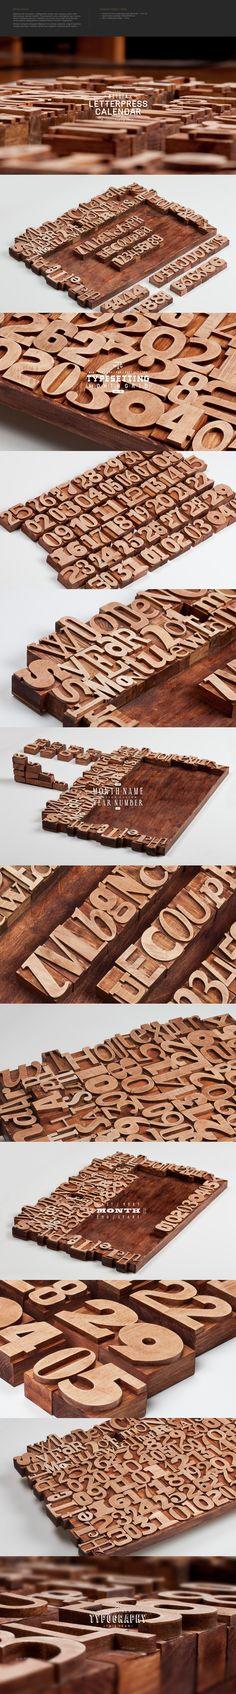 Wooden Letterpress perpetual Calendar? Wow wow wow wow!!!